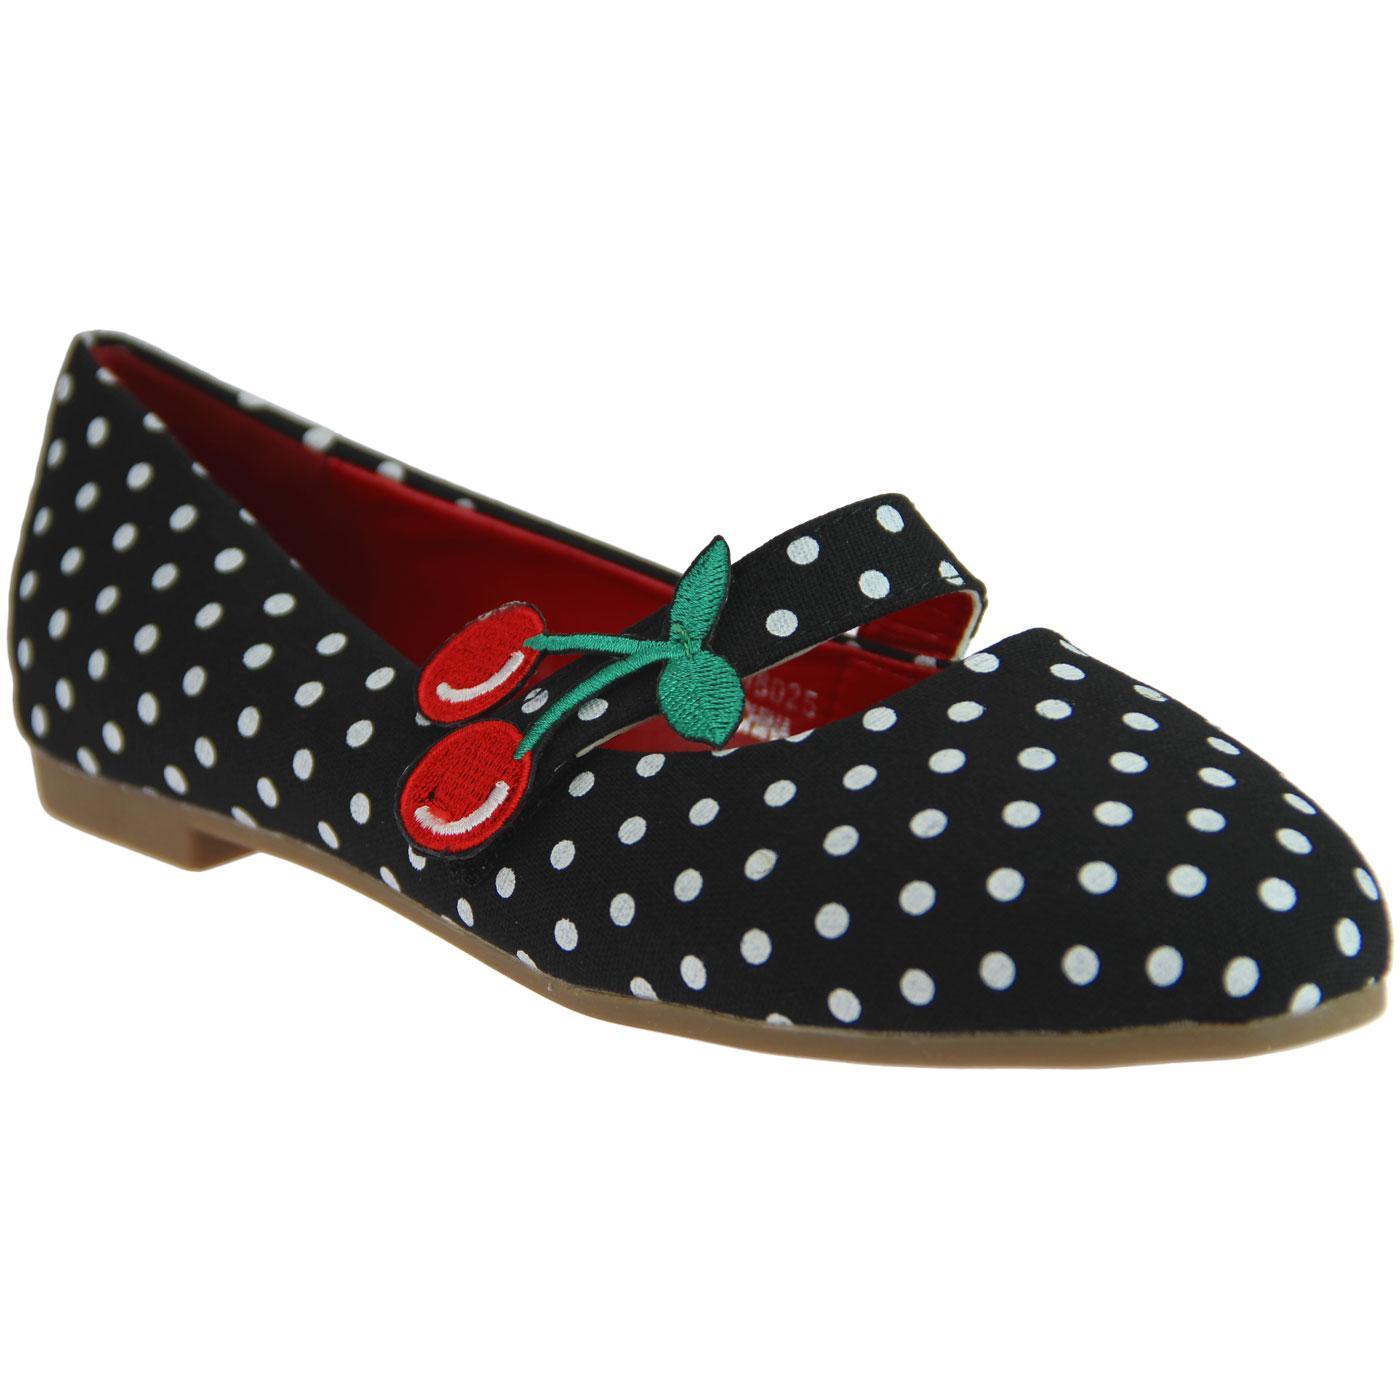 Sally LULU HUN Vintage 50s Cherry Polka Dot Flats